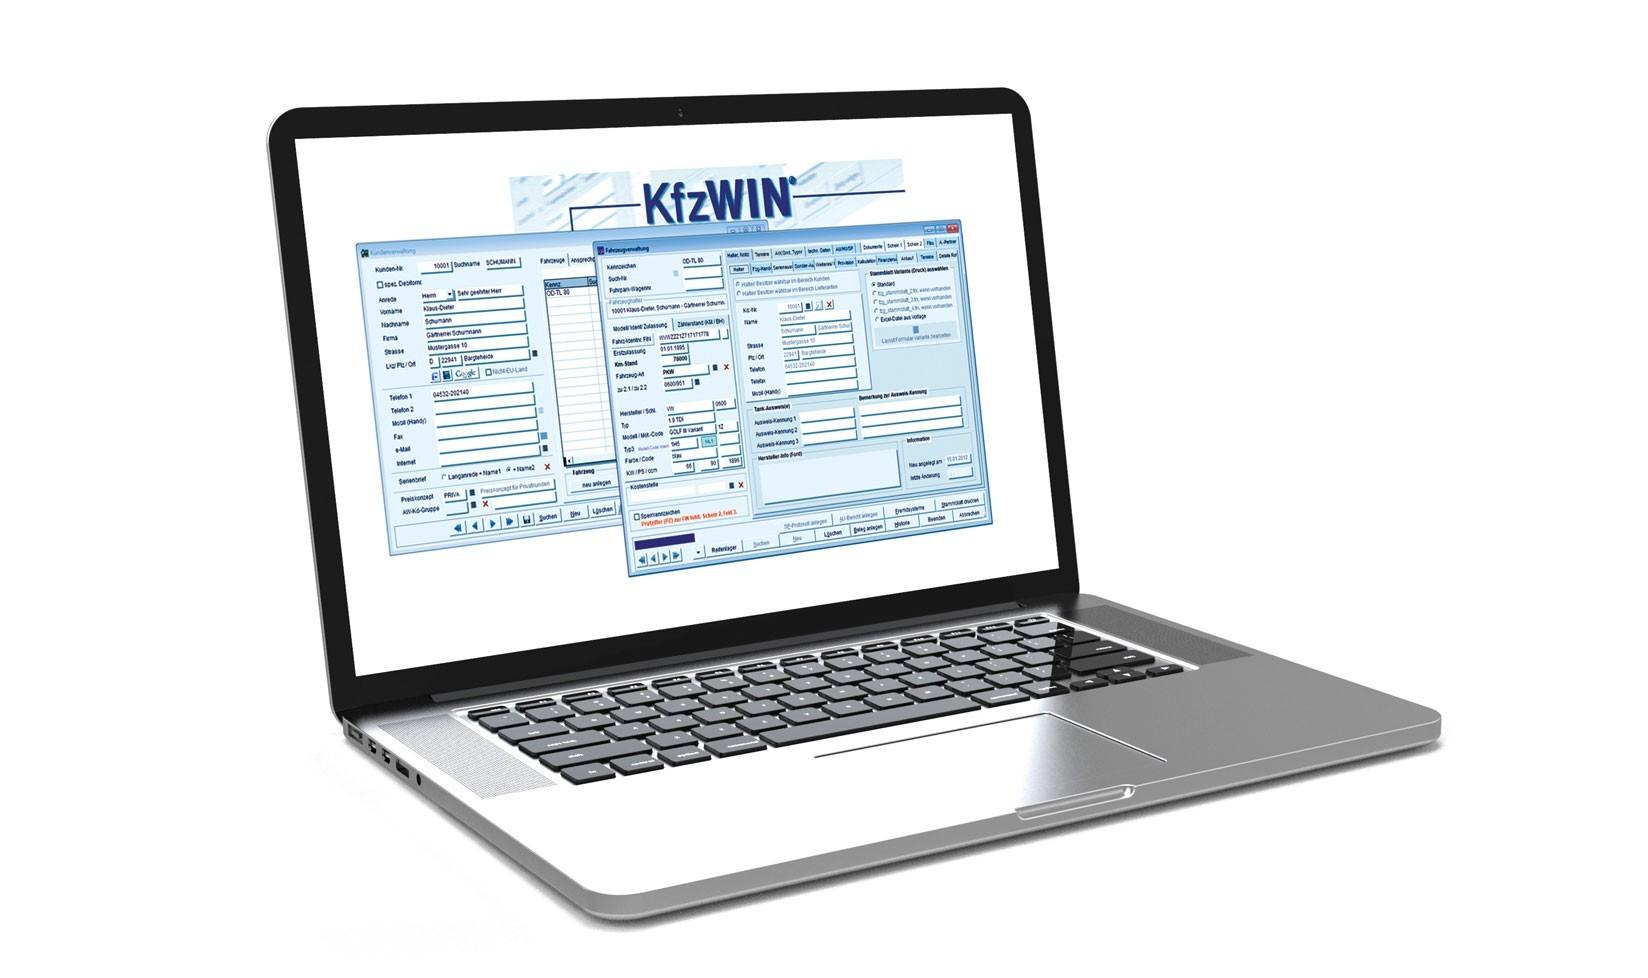 Laptop Screen KfzWIN